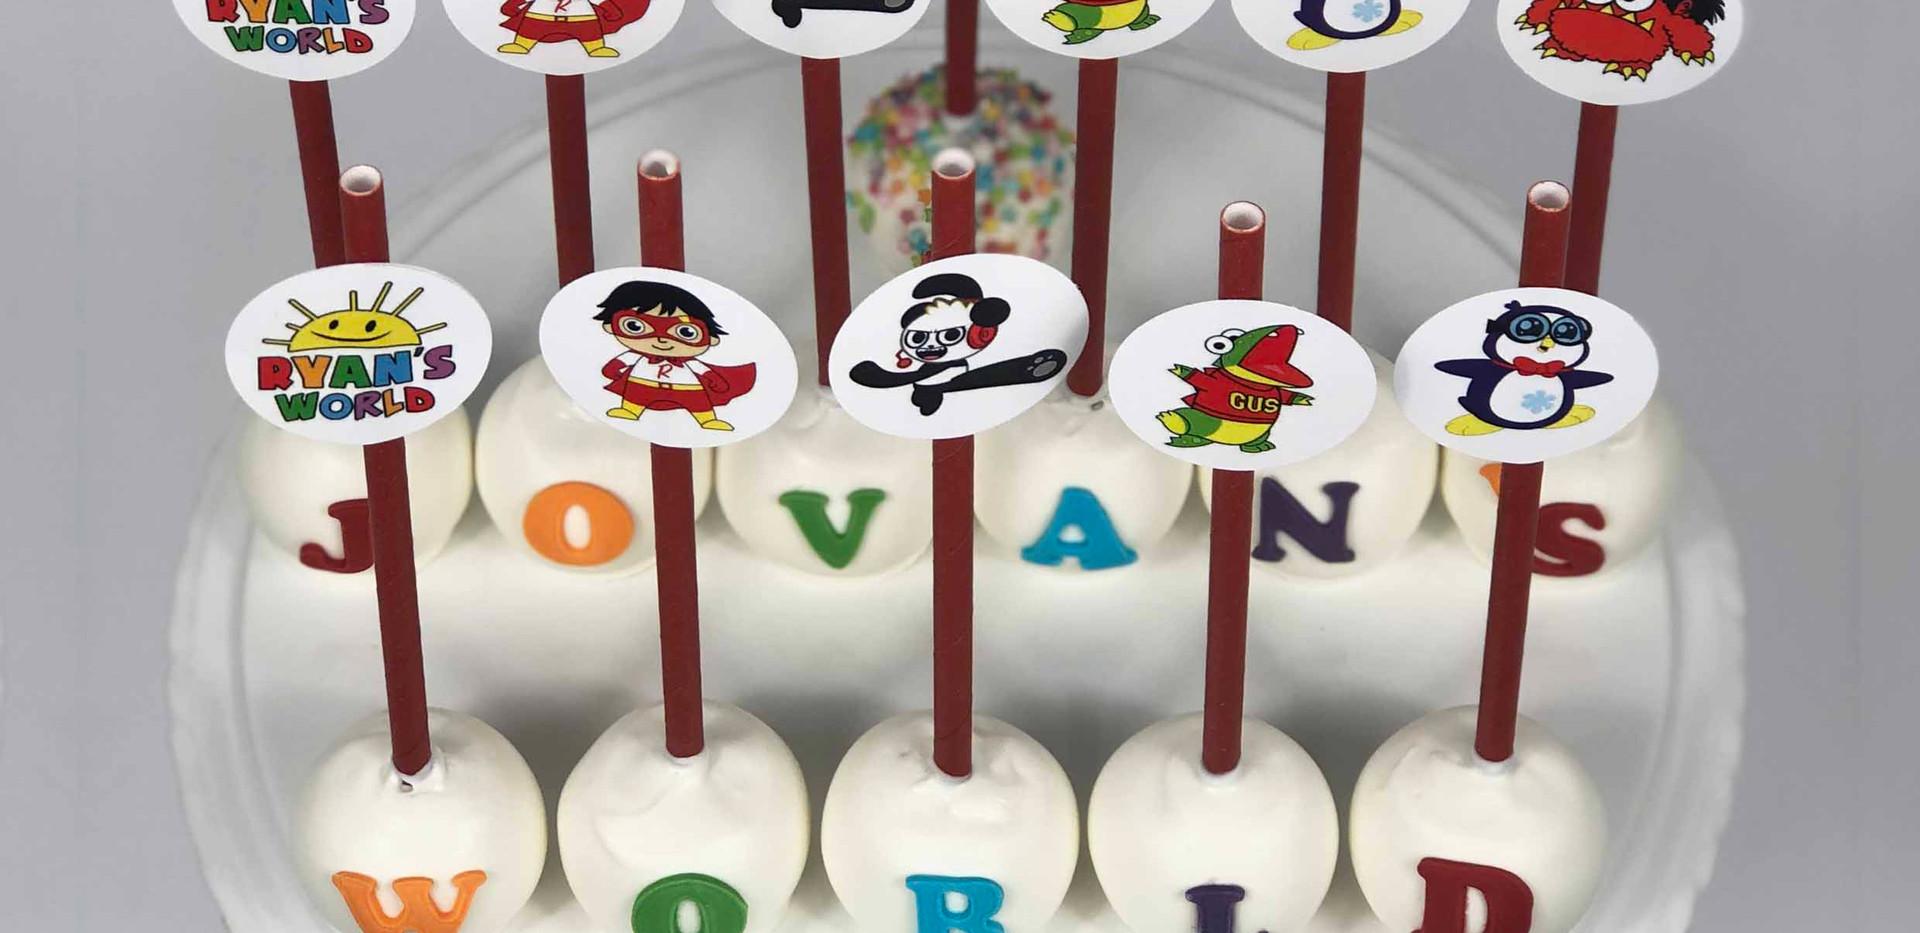 Ryans World Pops Image 3 with LOGO LR.jp